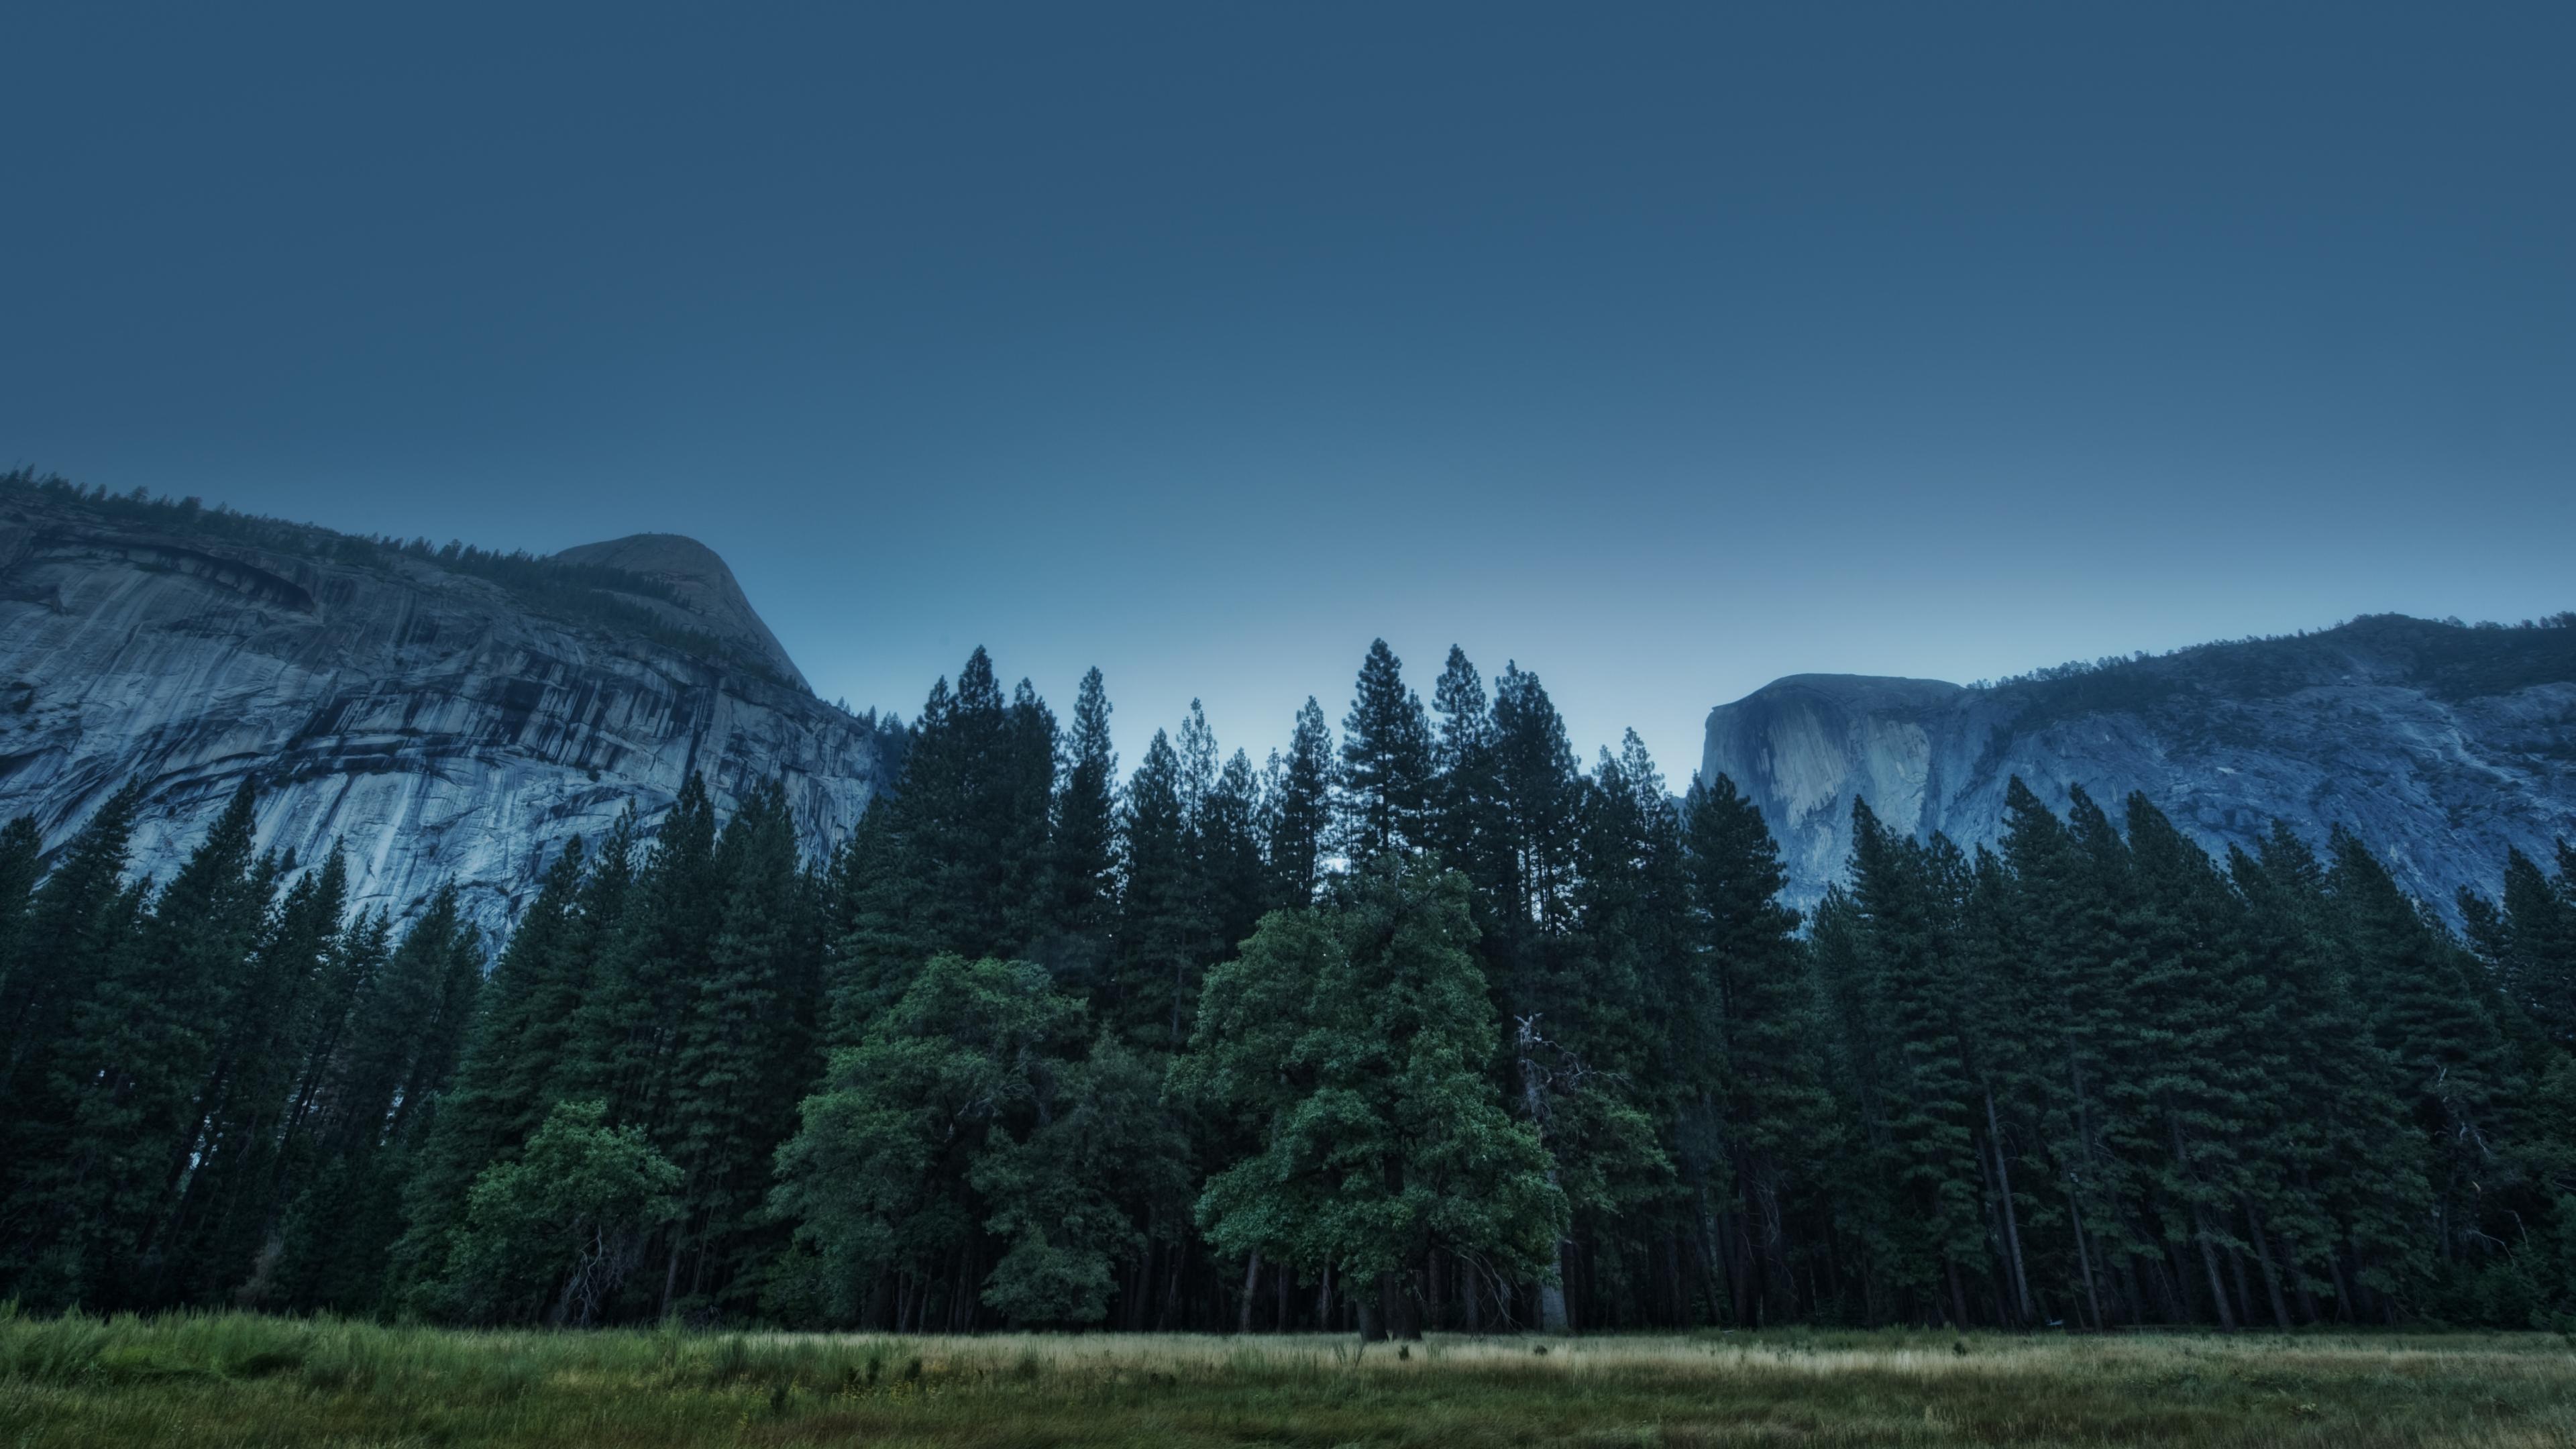 Pin Yosemite Valley Hd Desktop Wallpaper Widescreen High Definition on 3840x2160